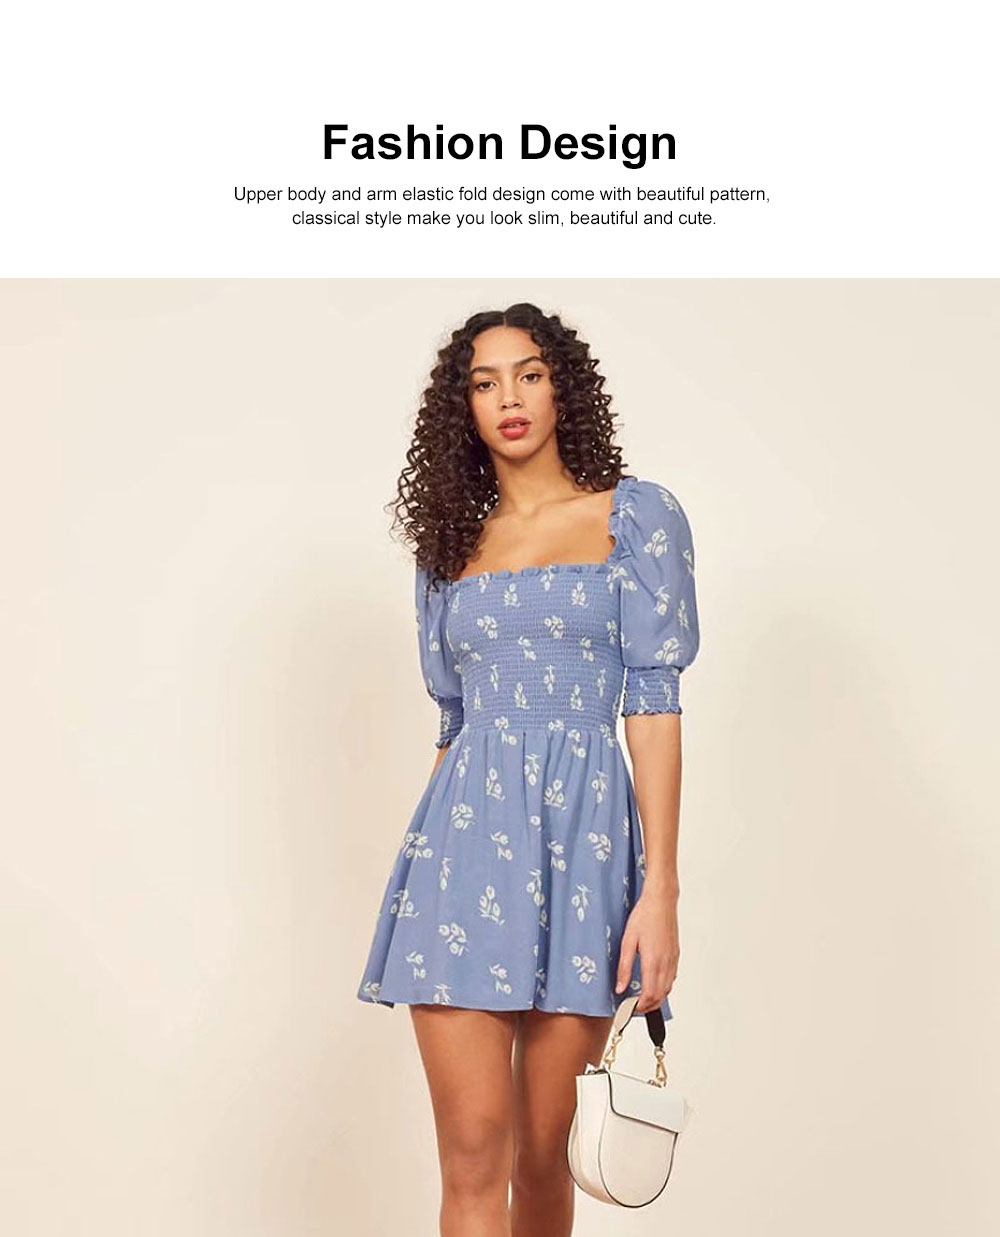 One Piece French Style Women Dress Pleated &High Waist Knee Length Summer Dress Ruffle Sleeve Dress for Women's Gifts 2